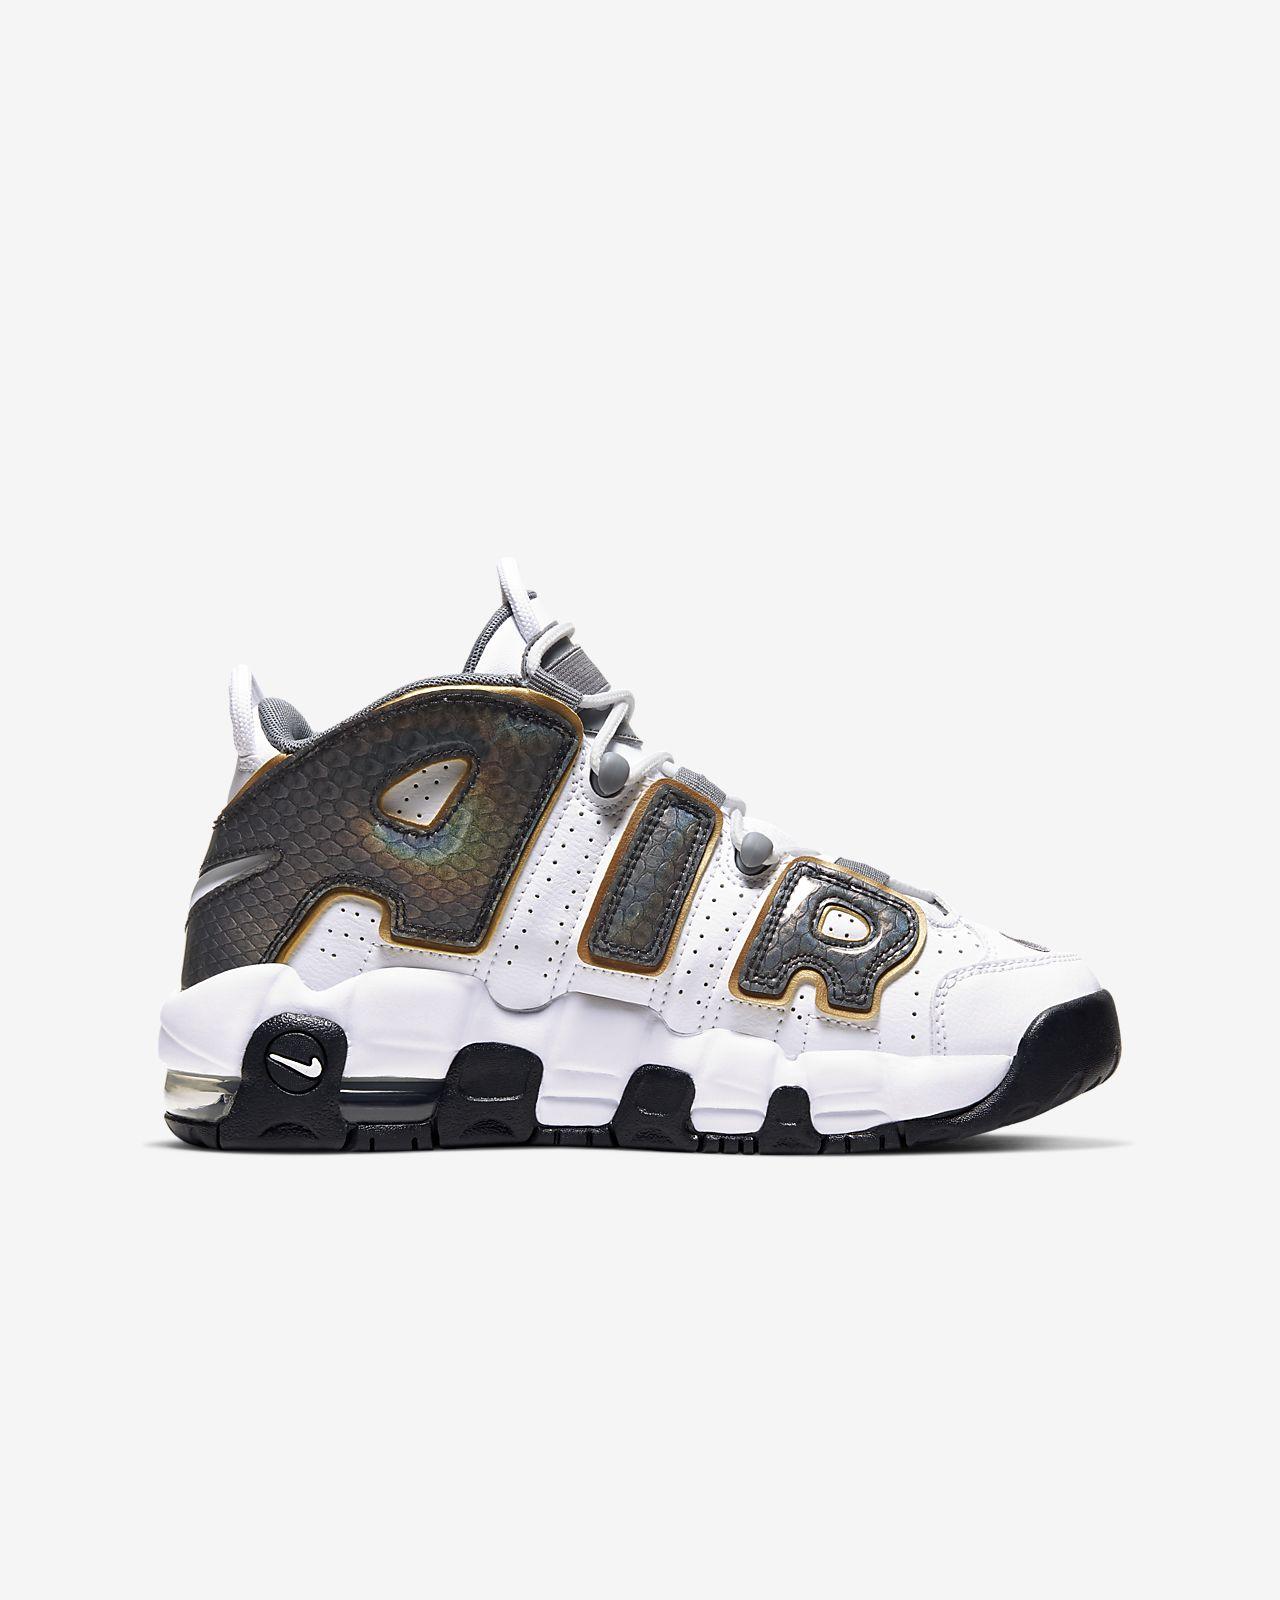 Nike Air More Uptempo SE Schuh für ältere Kinder